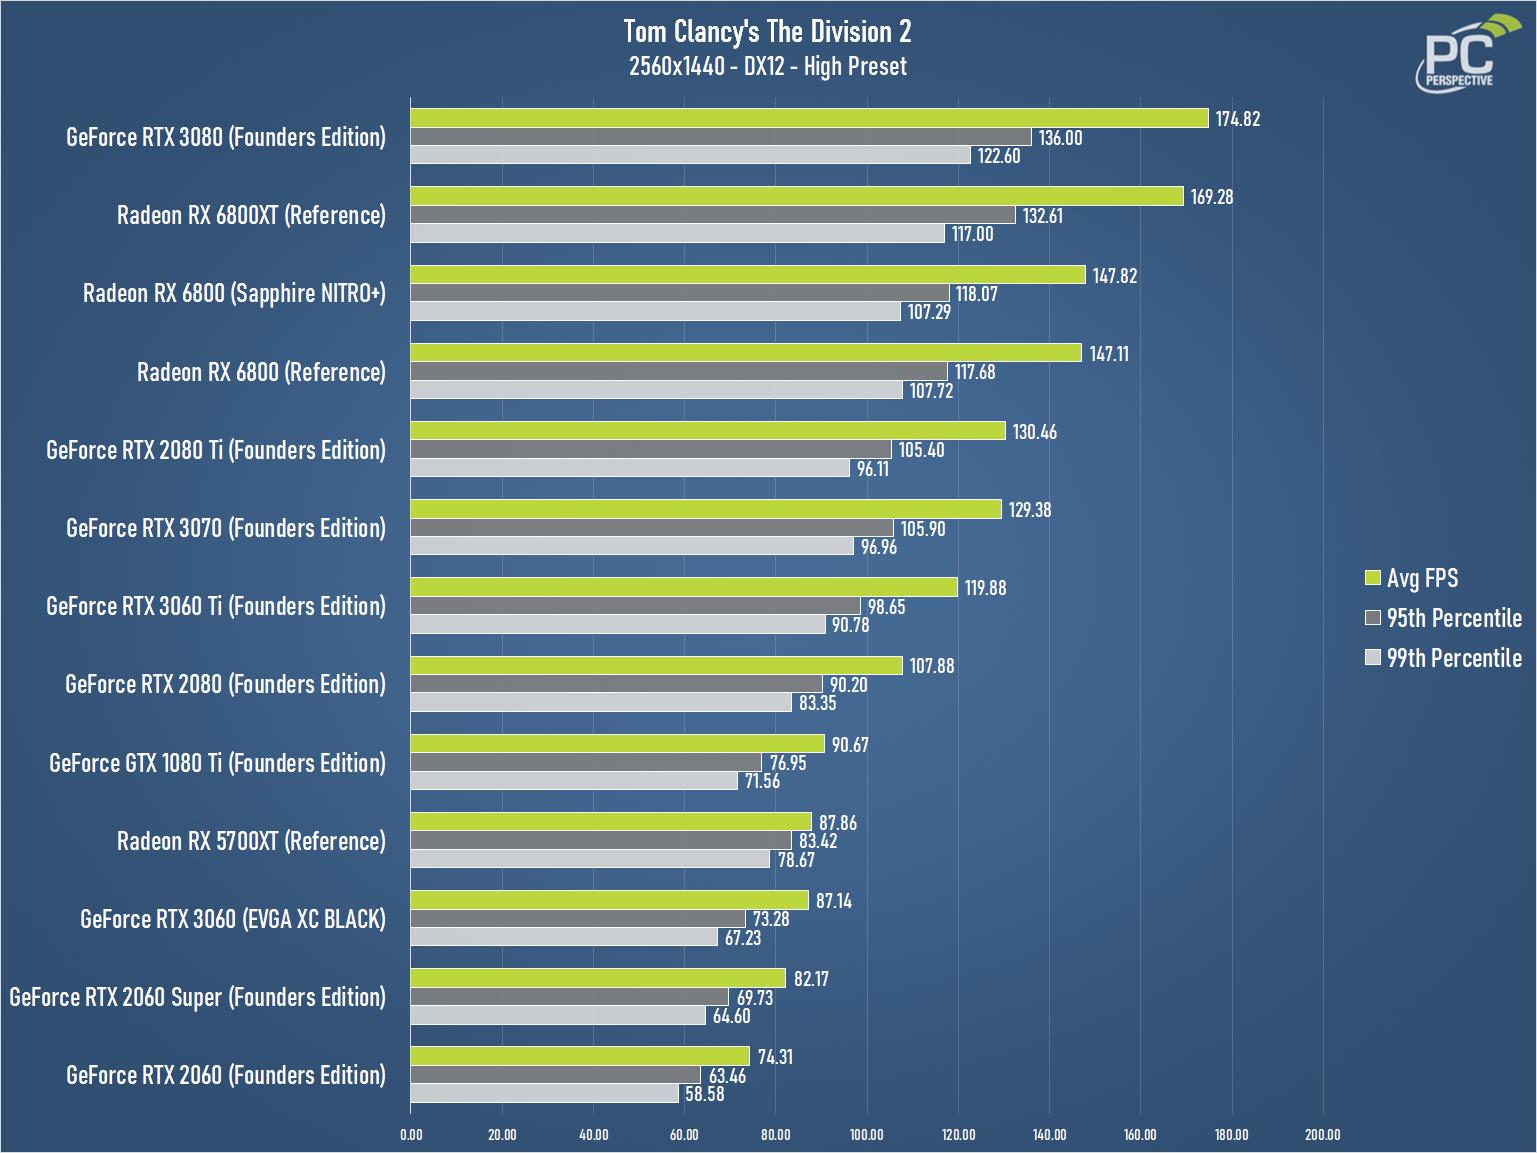 GeForce RTX 3060 EVGA XC BLACK The Division 2 1440 Chart